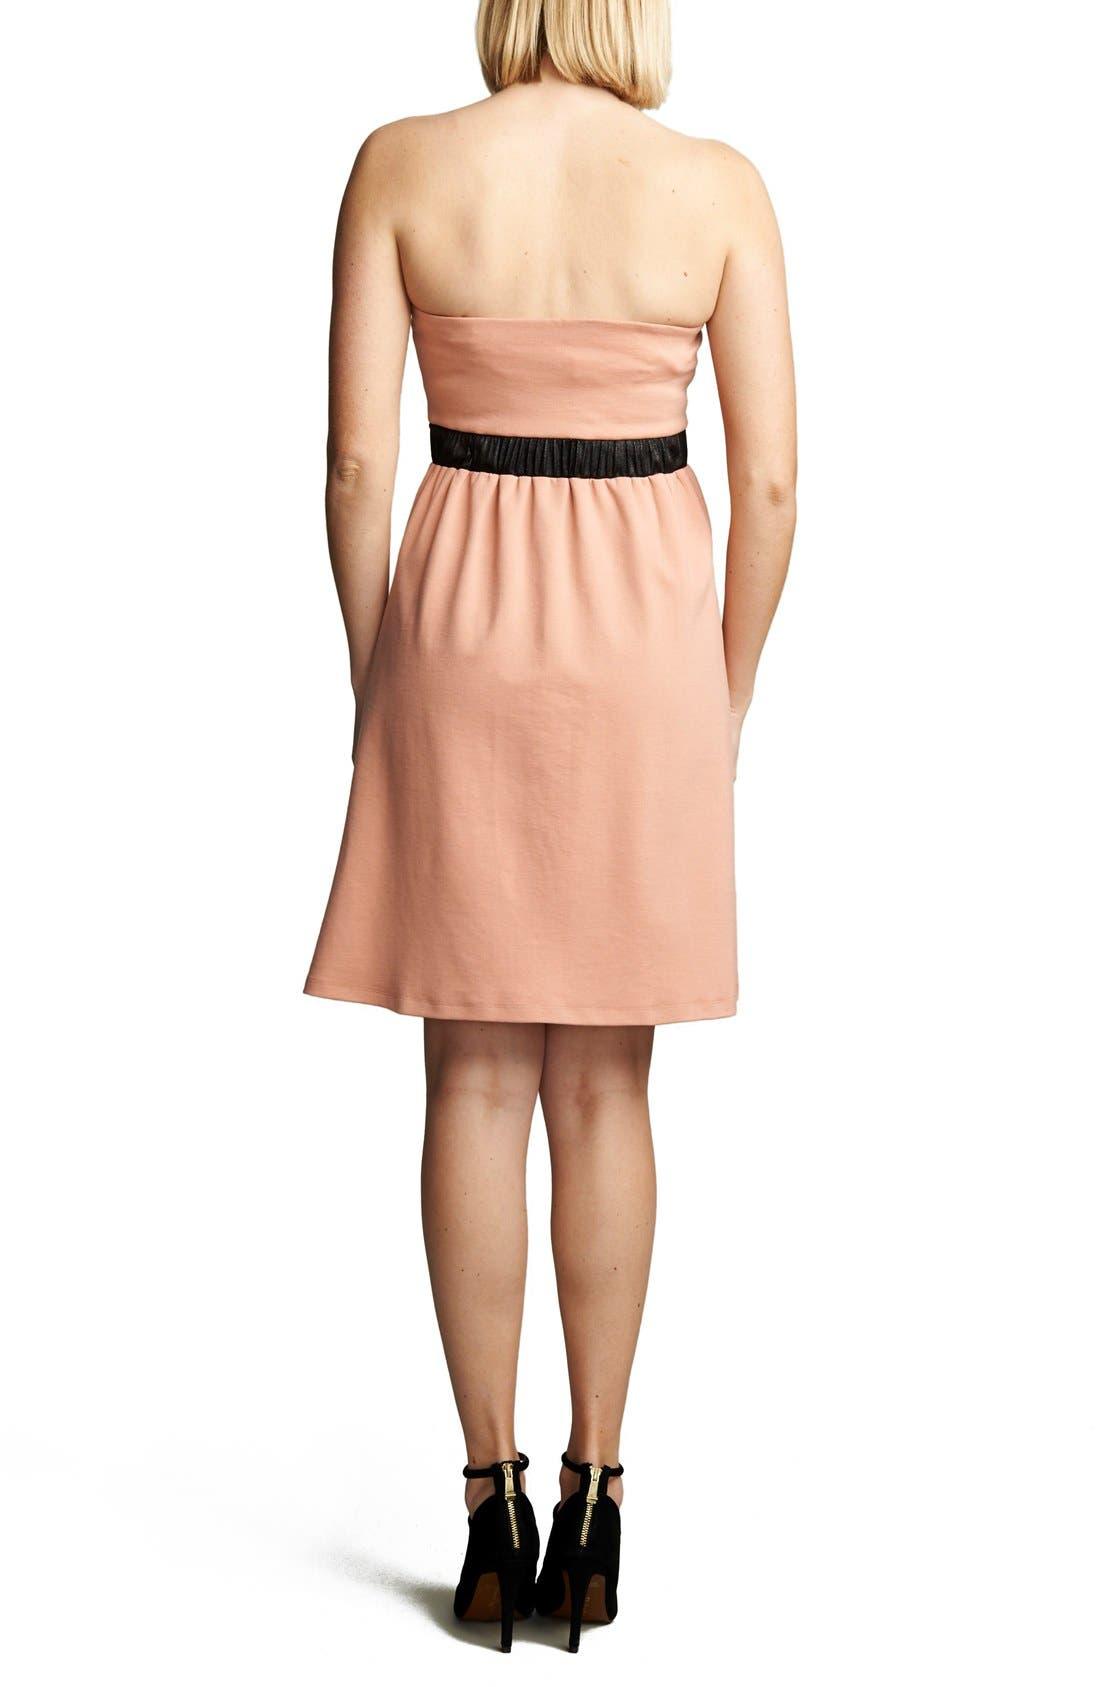 Strapless Maternity Dress,                             Alternate thumbnail 2, color,                             Blush/ Black